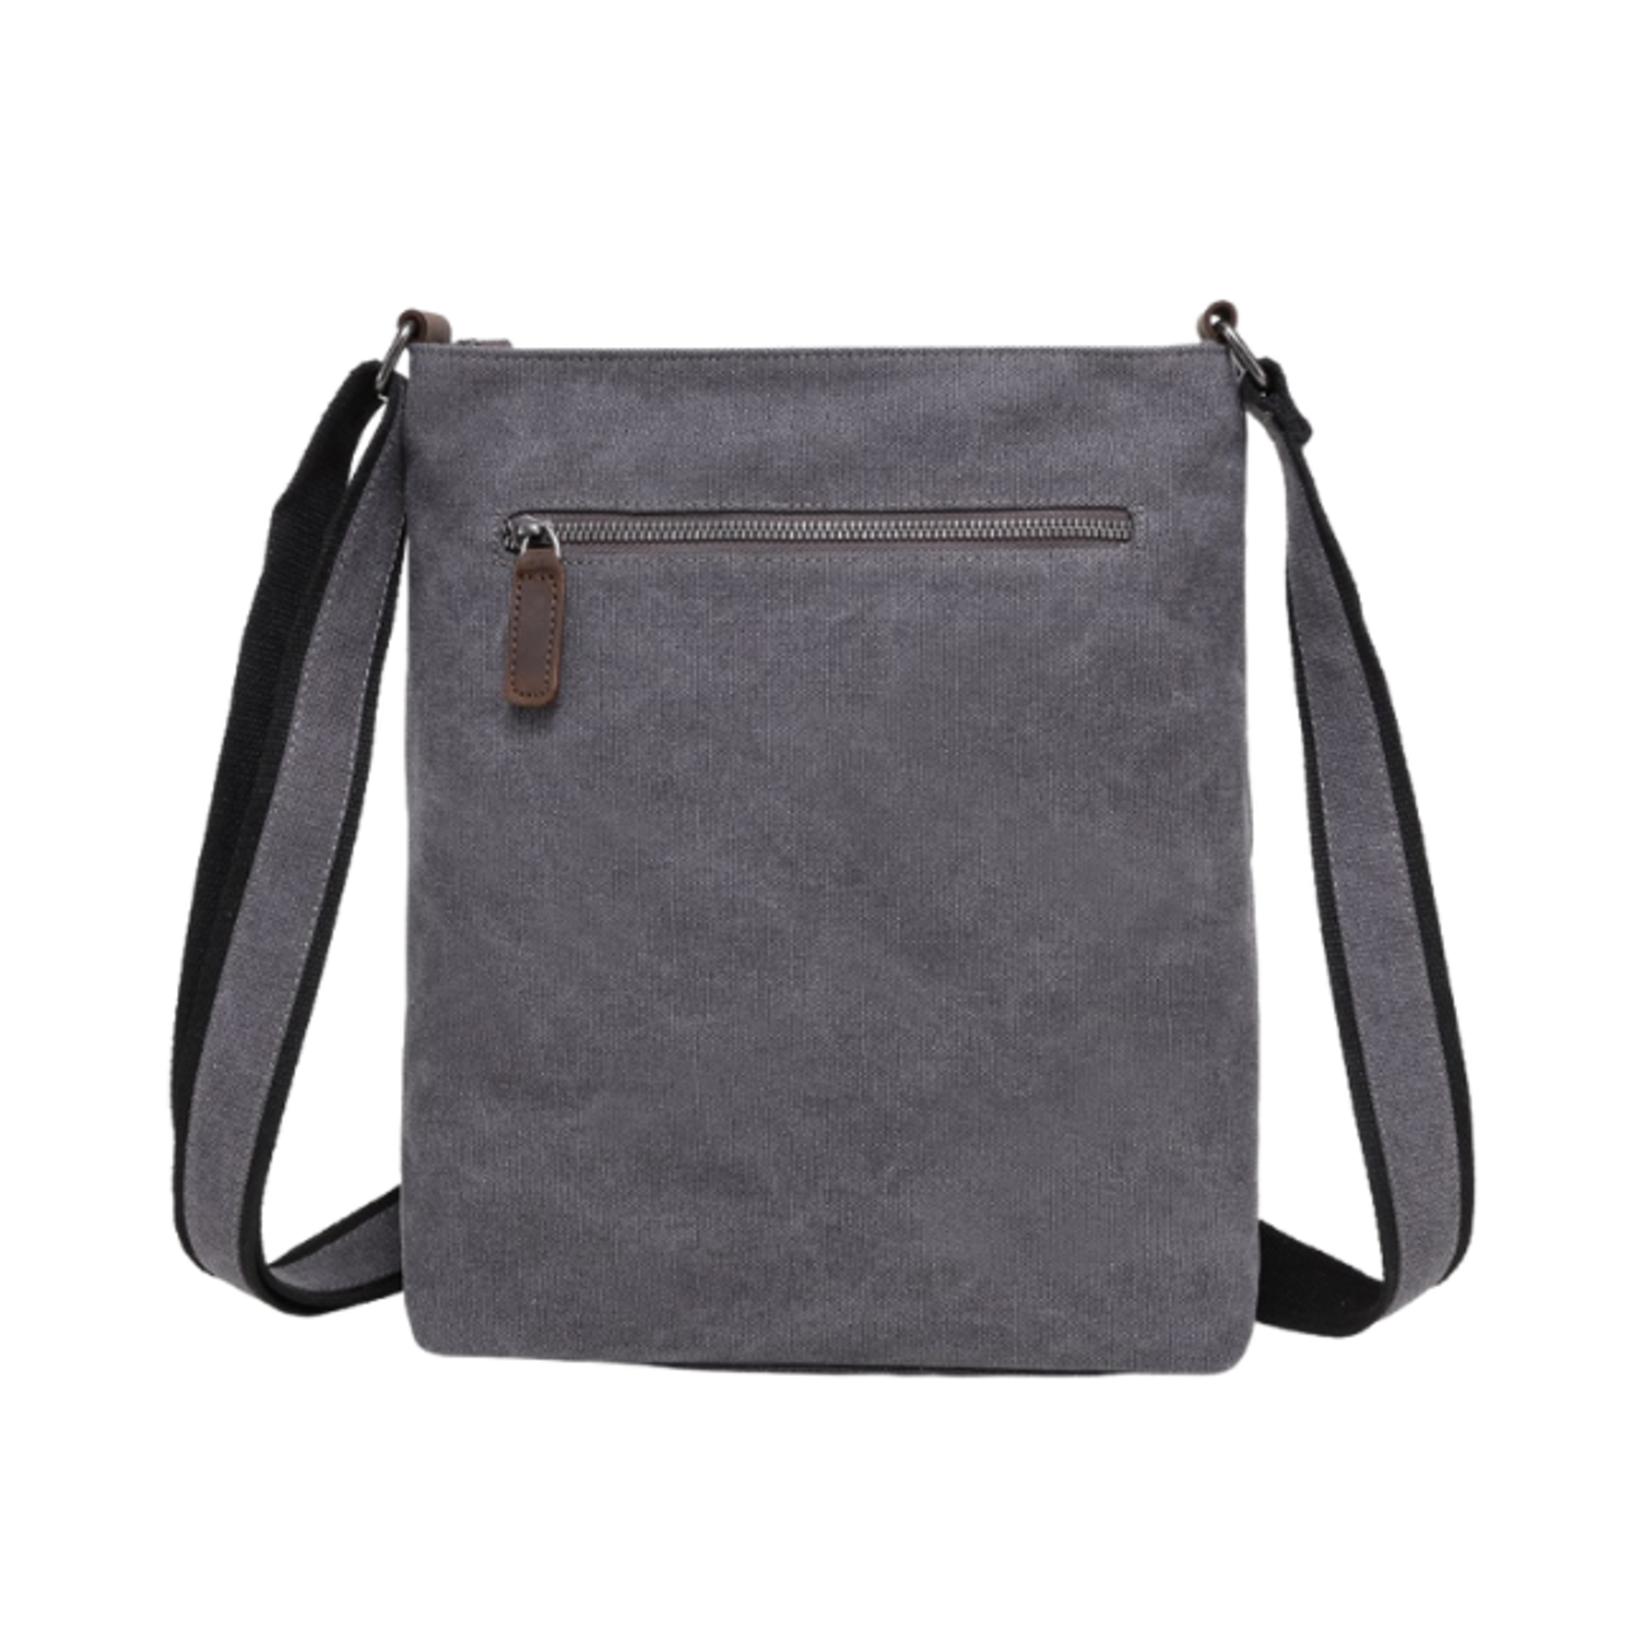 DAVAN DAVAN SMALL MESSENGER BAG